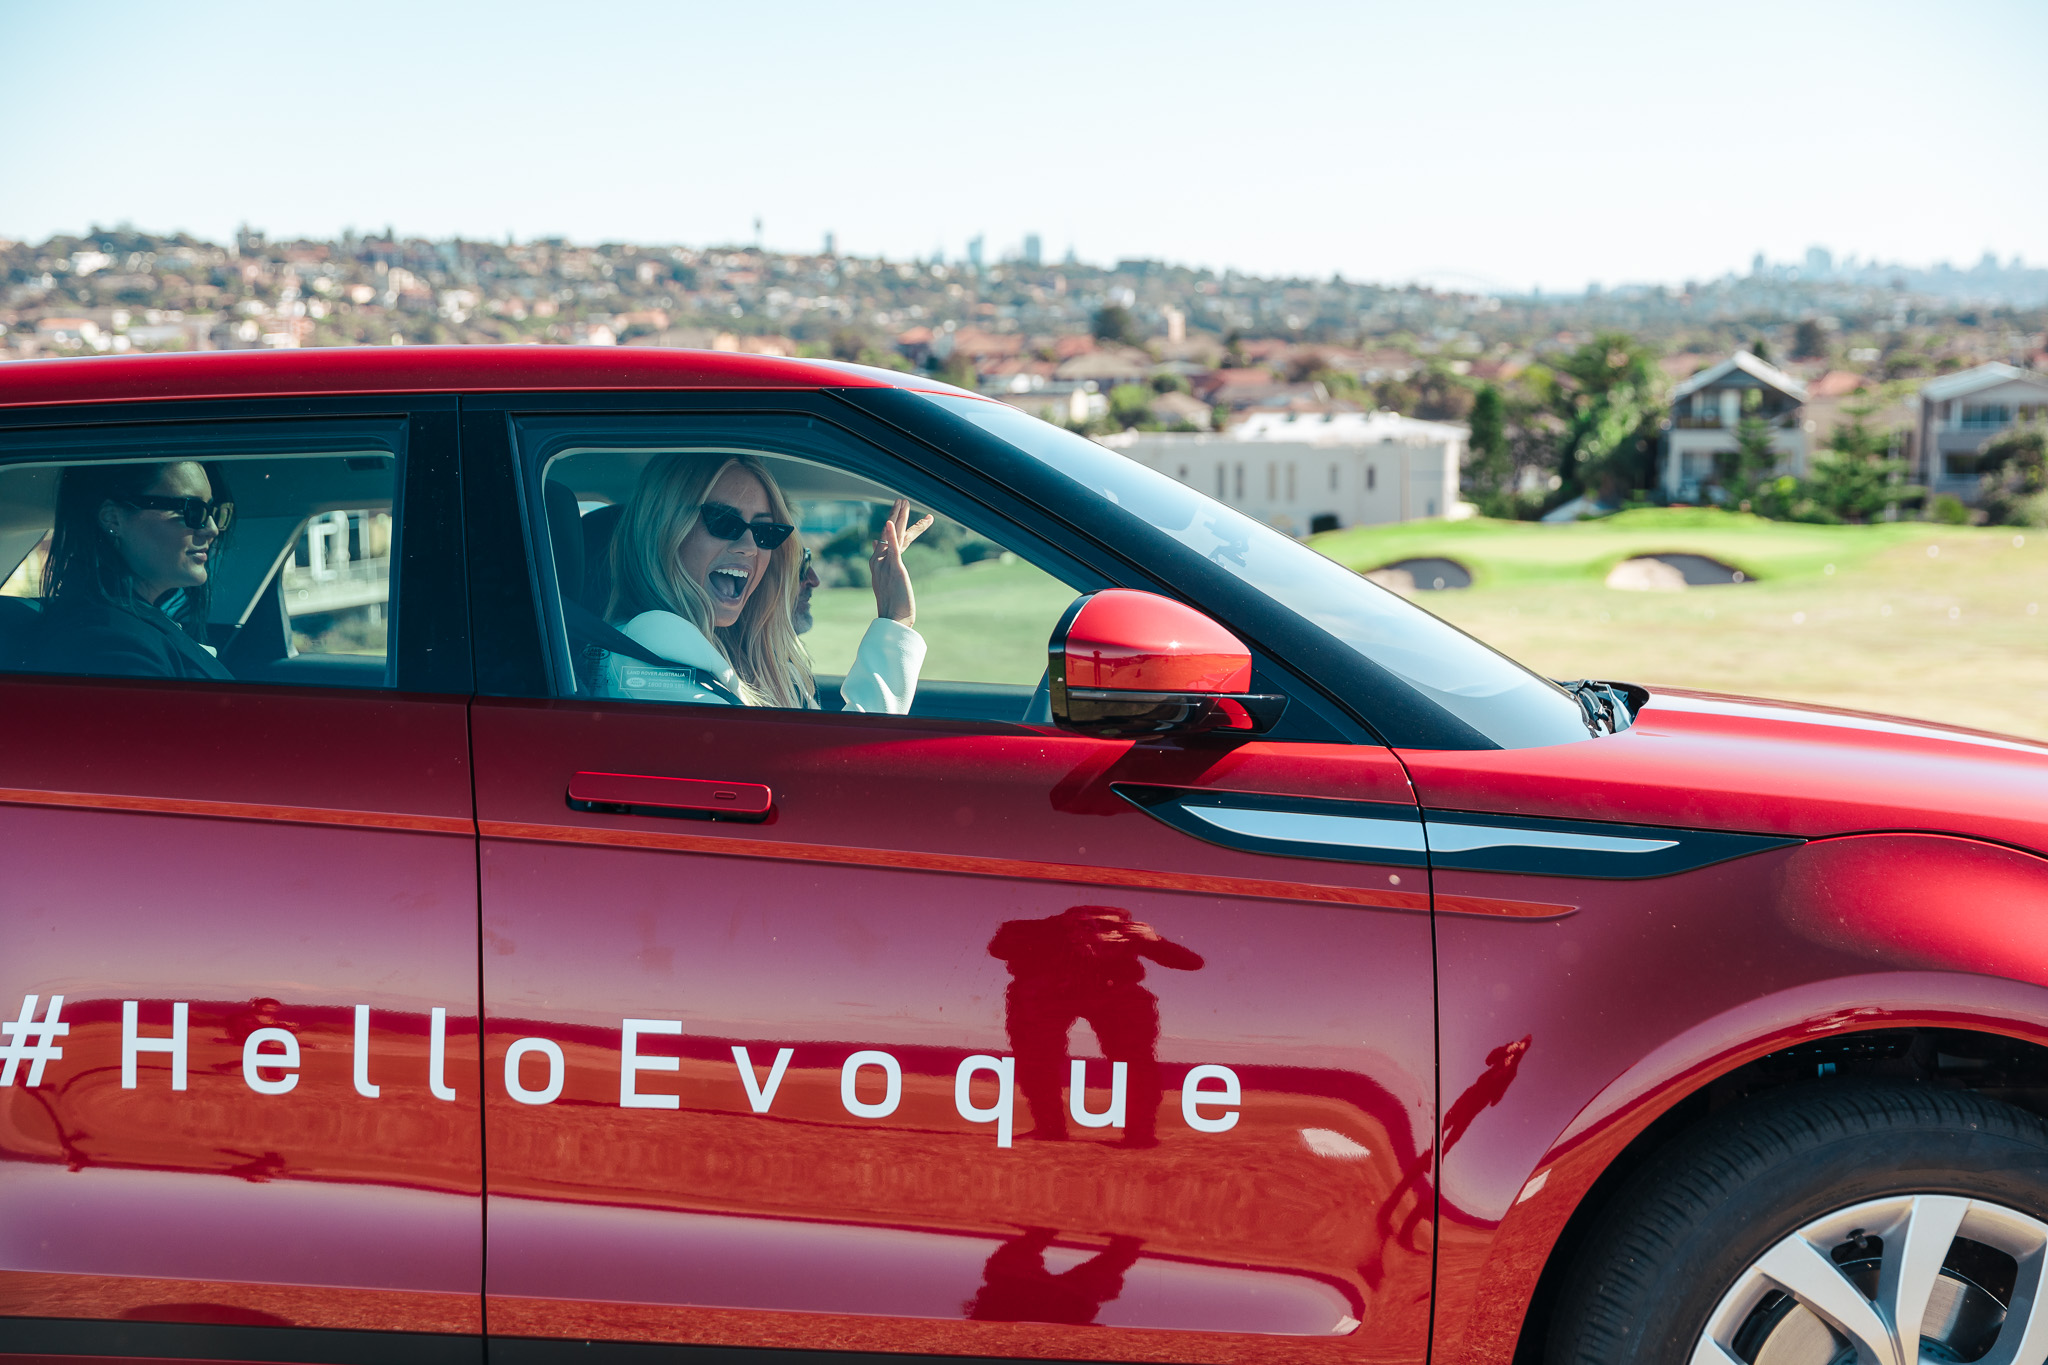 ELYSE KNOWLES RANGE ROVER EVOQUE 2019 25.jpg